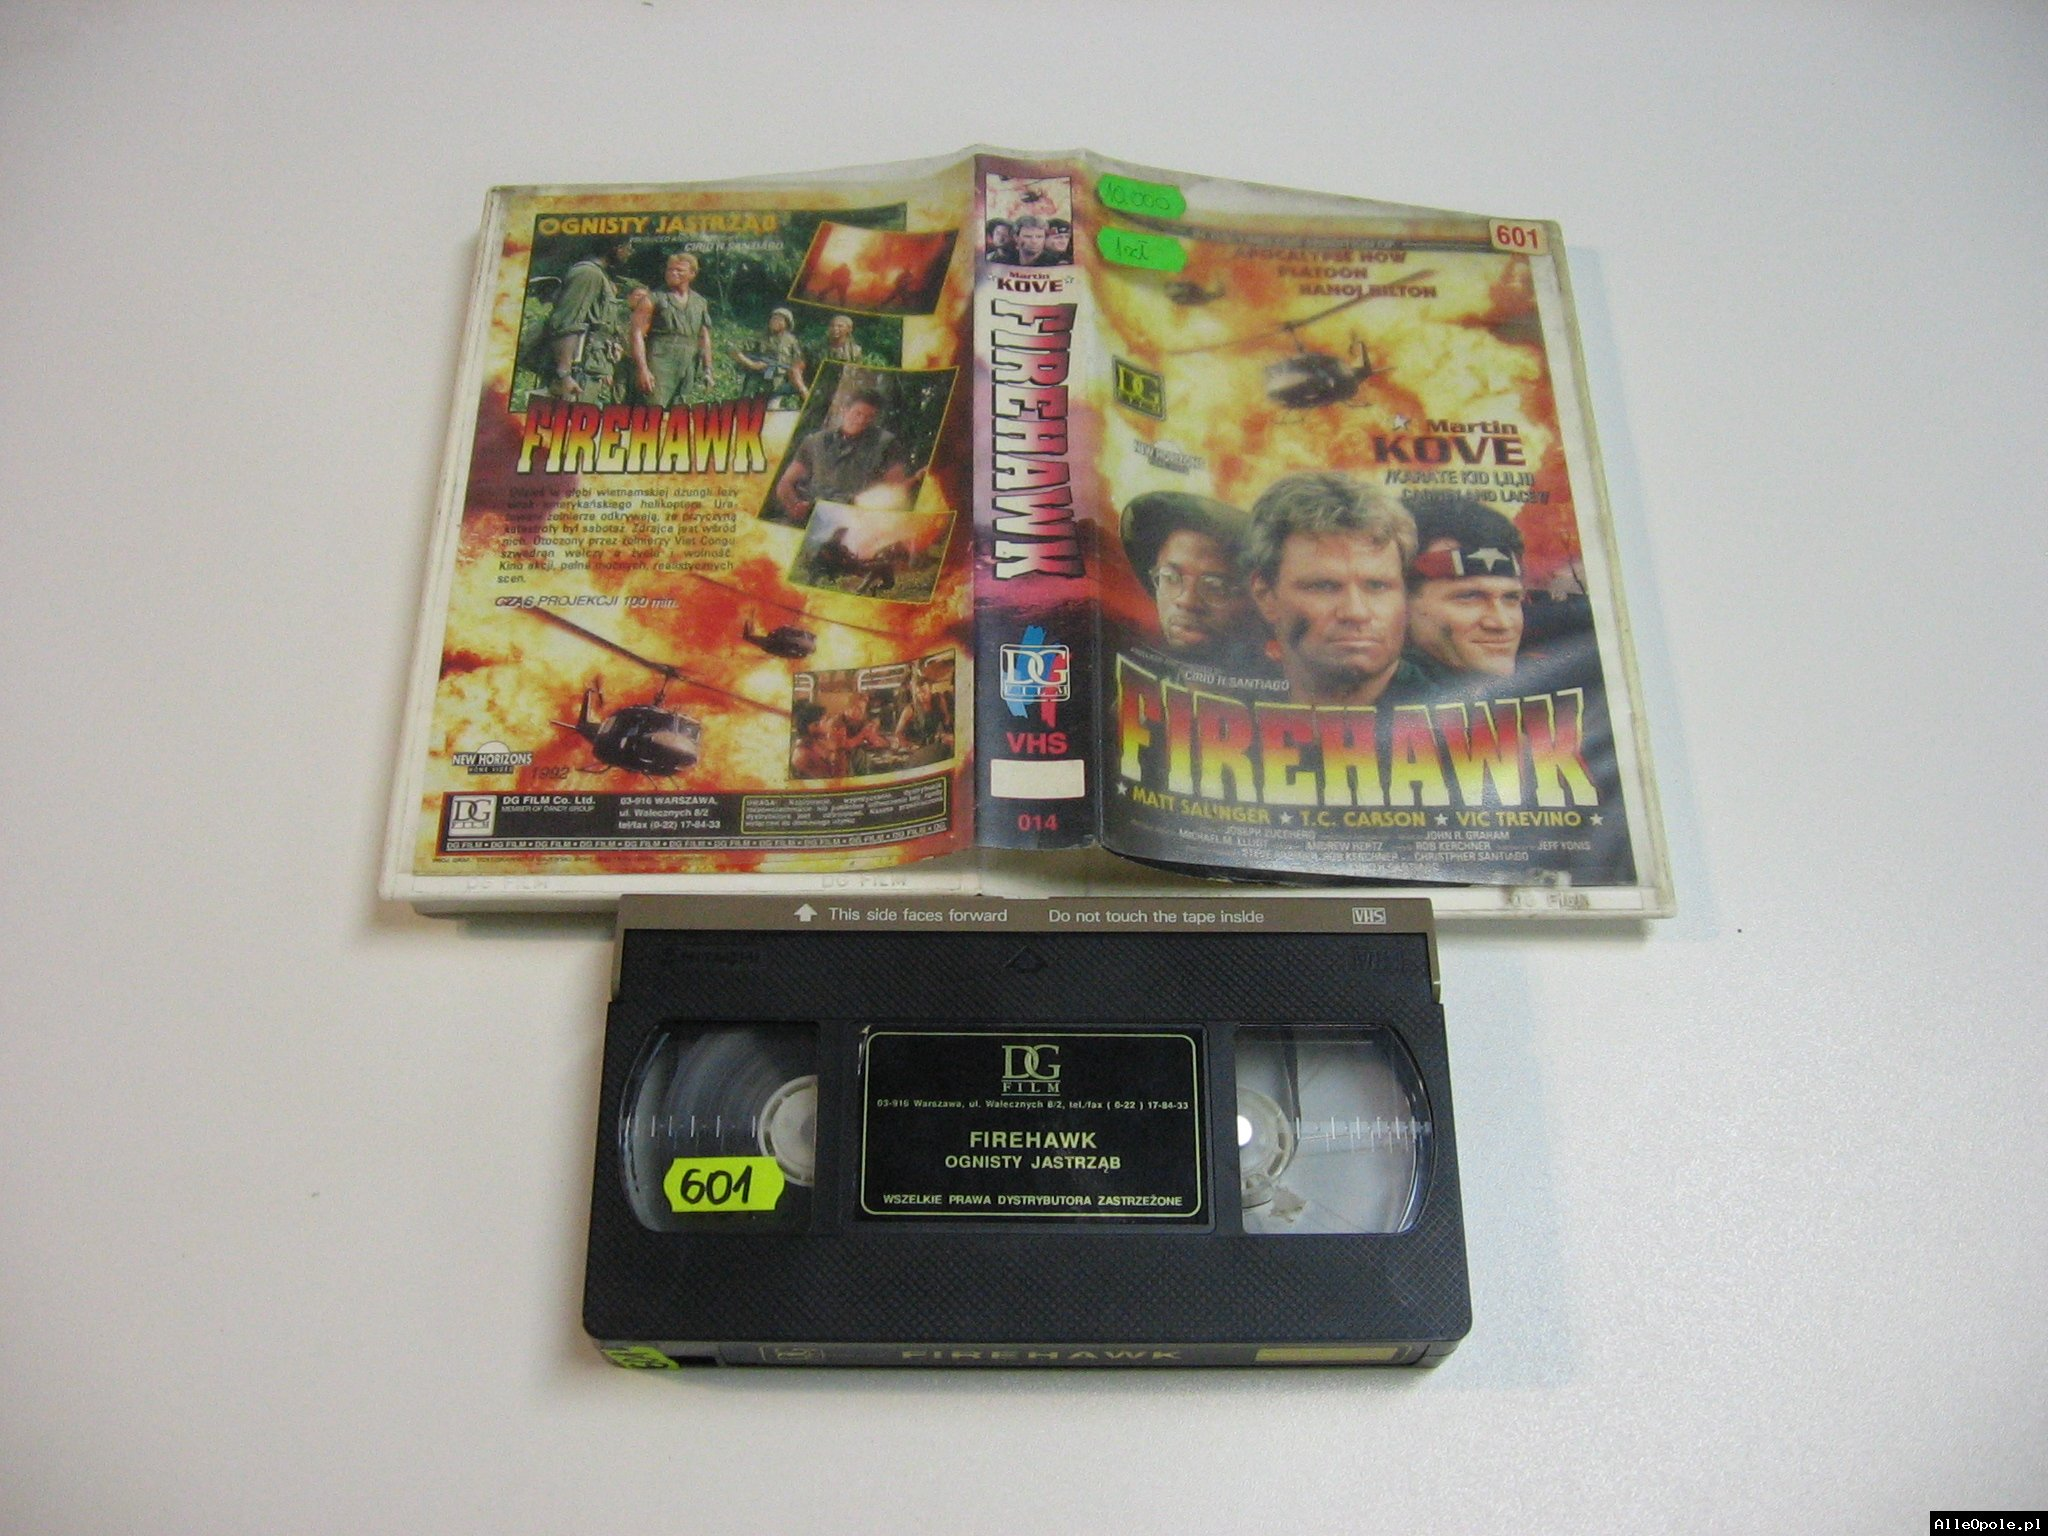 OGNISTY JASTRZĄB - VHS Kaseta Video - Opole 1830